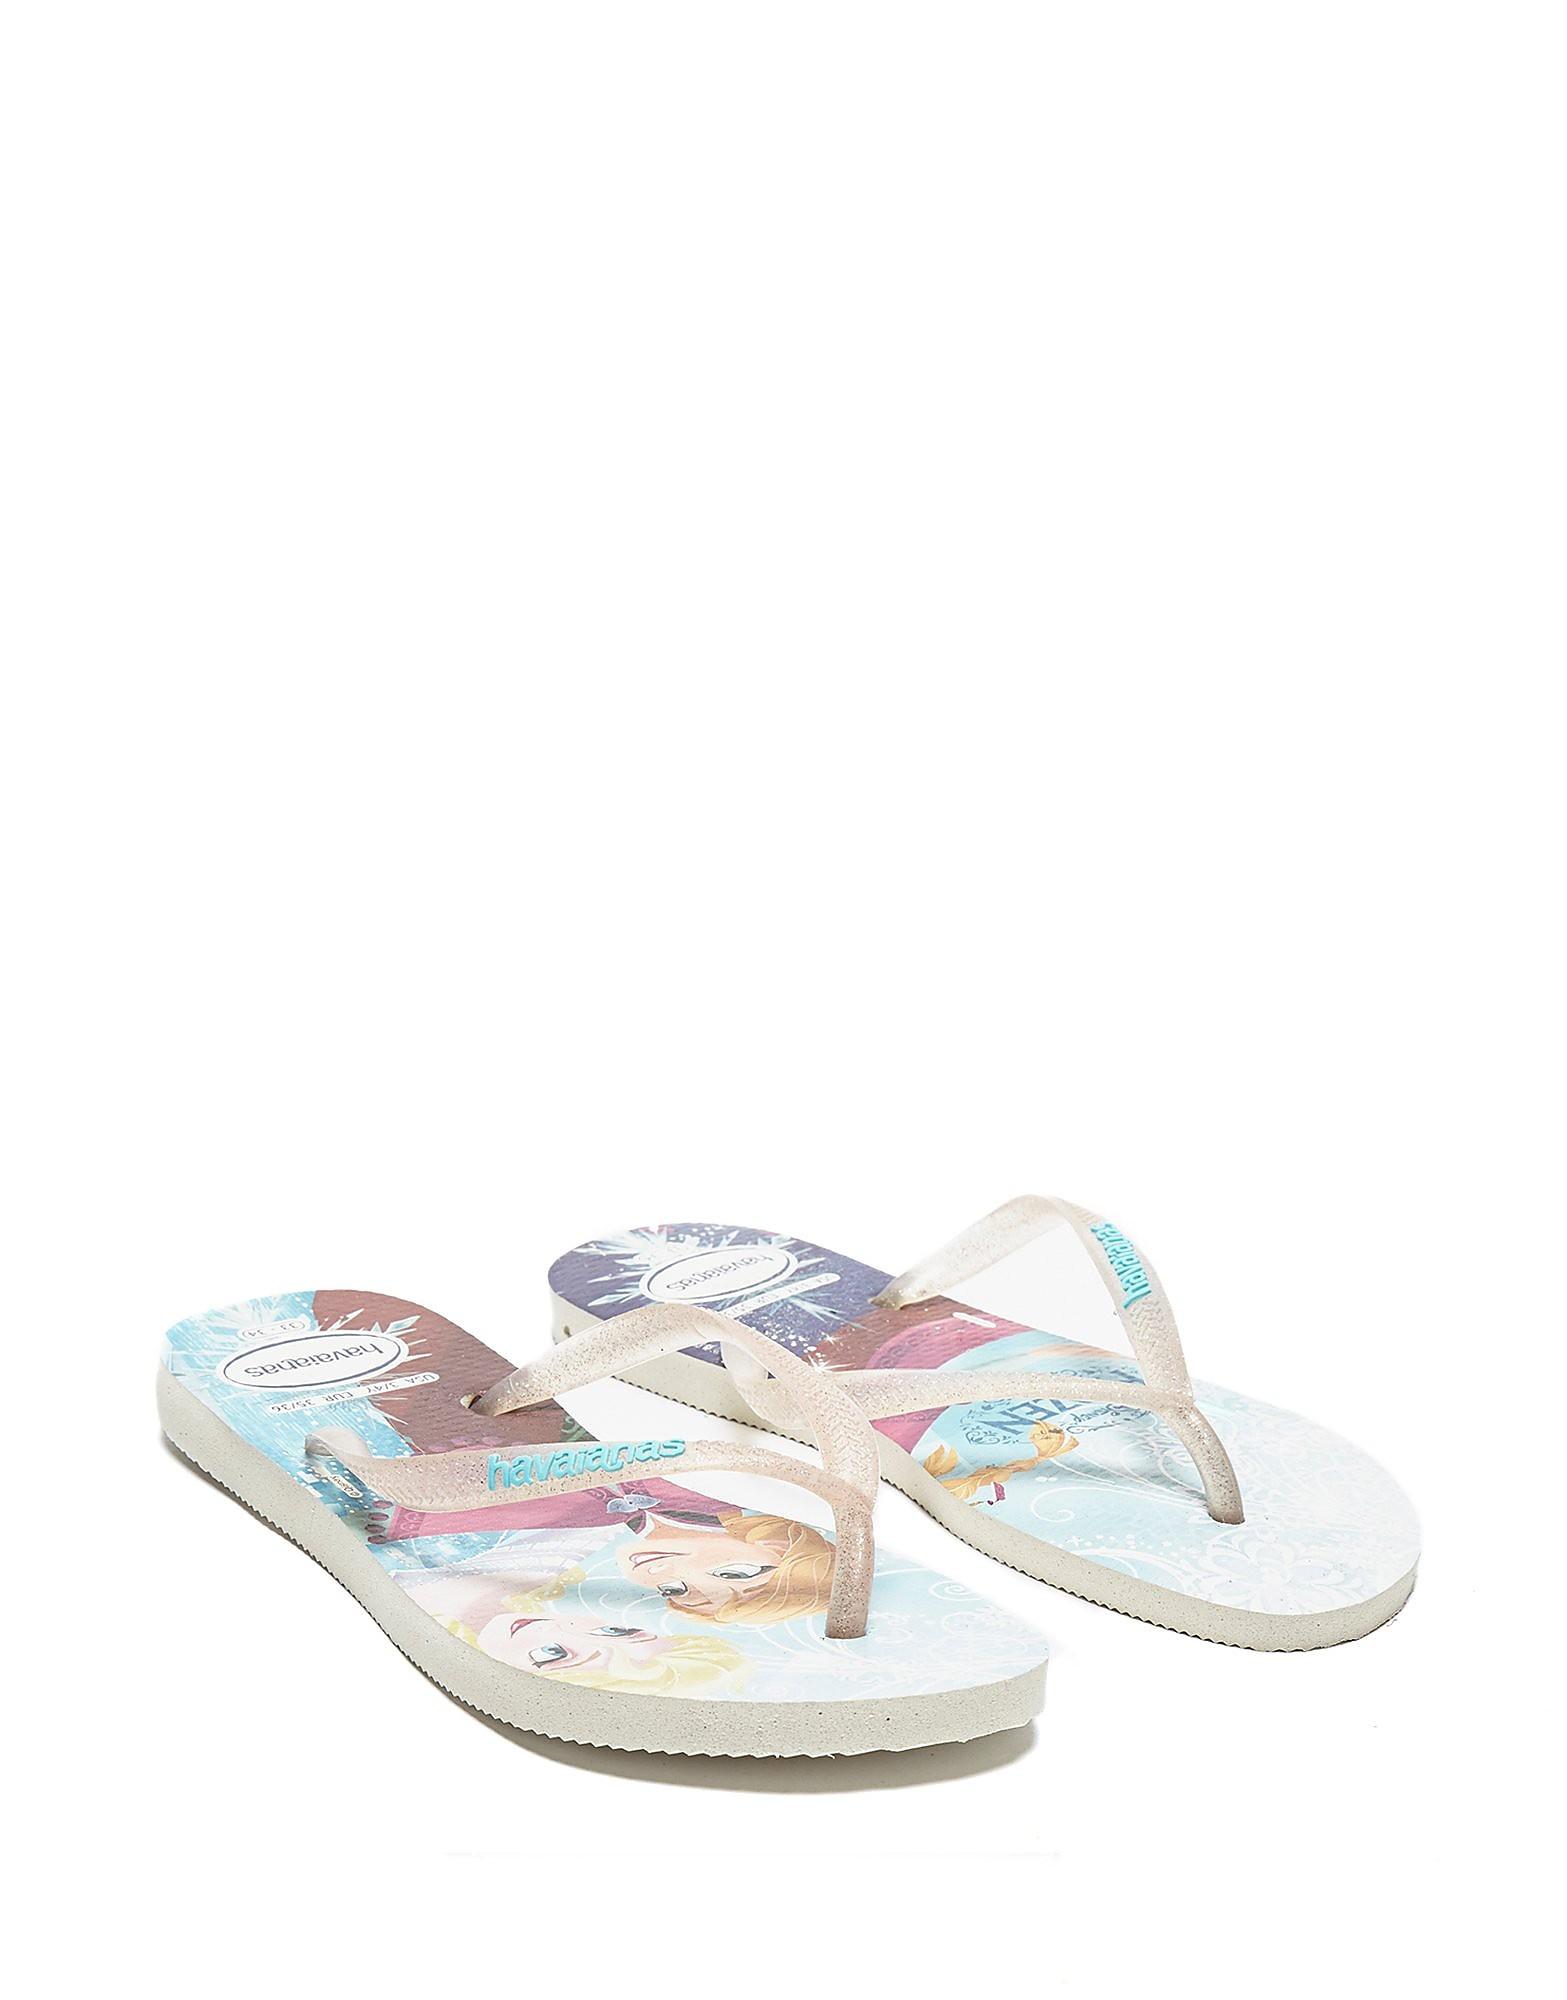 Havaianas Slim Princess Flip Flops Children